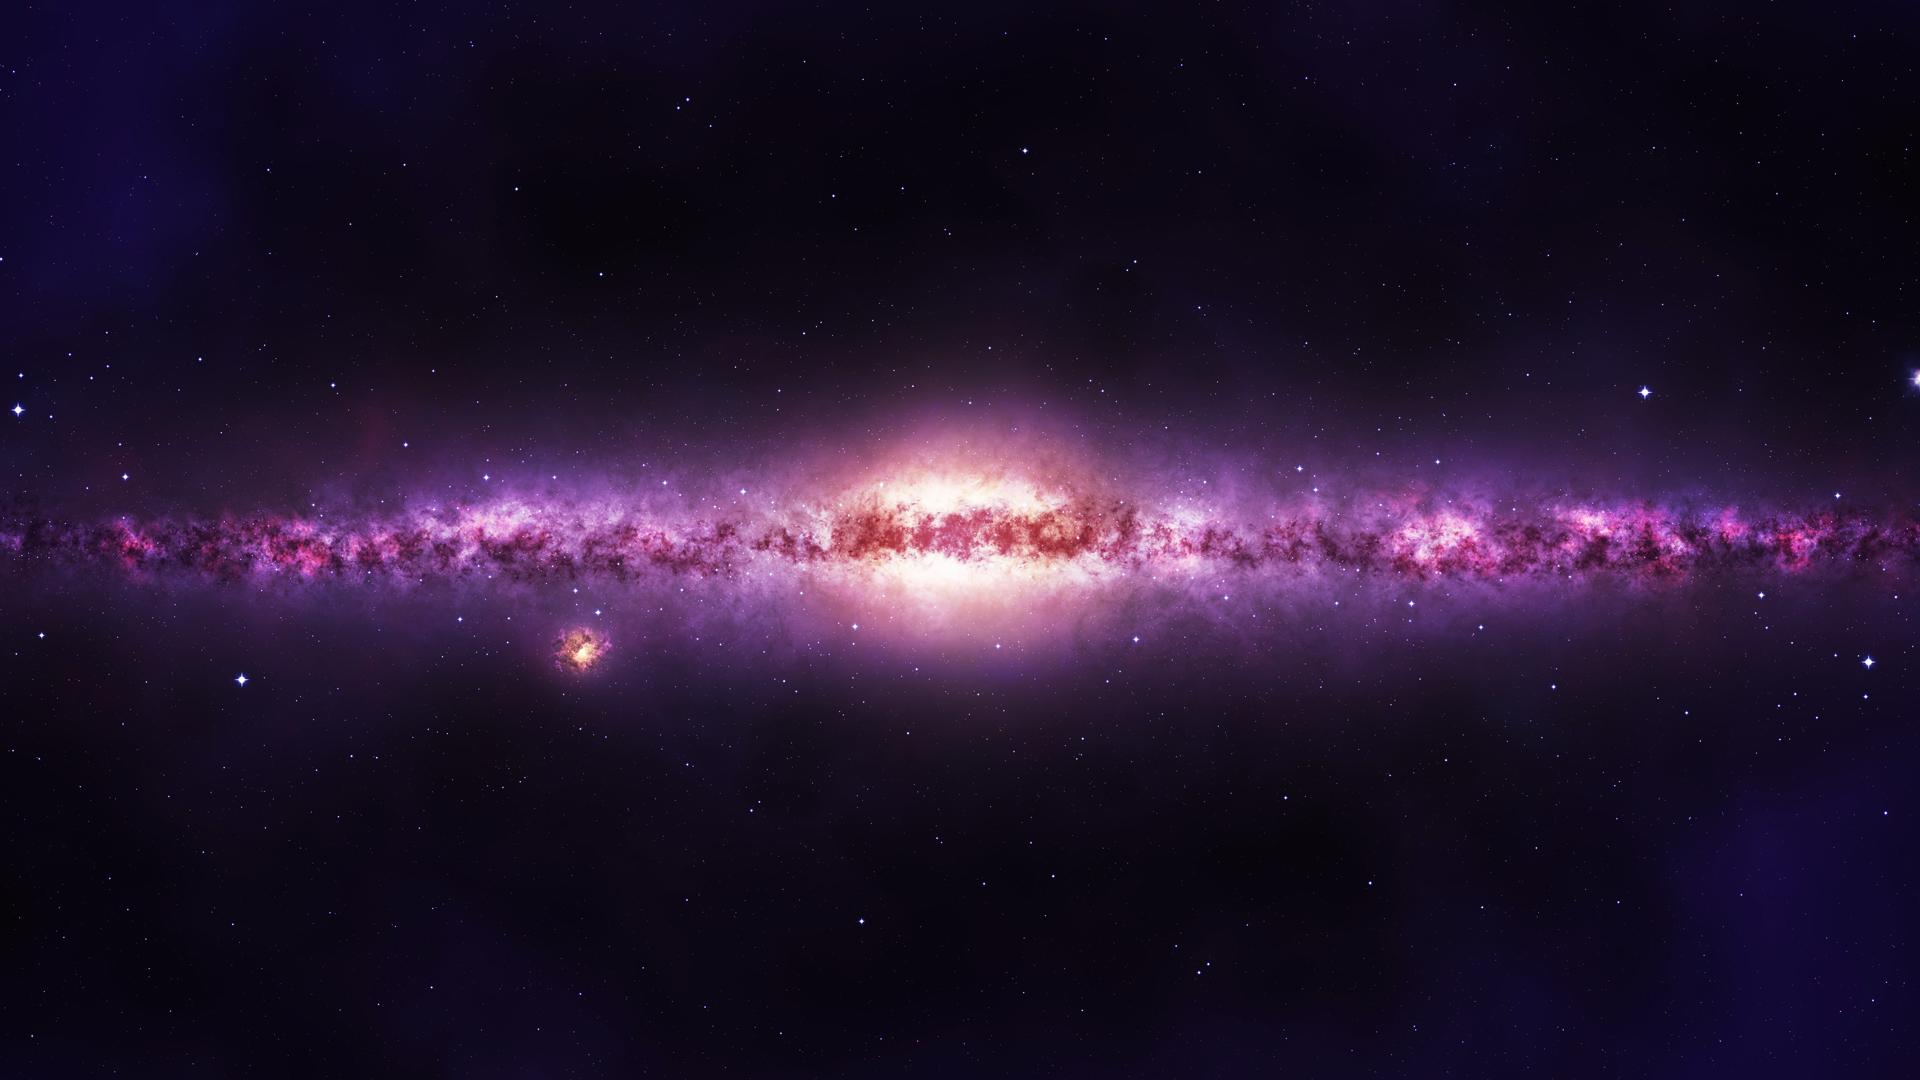 purple galaxy stars wallpaper - photo #2